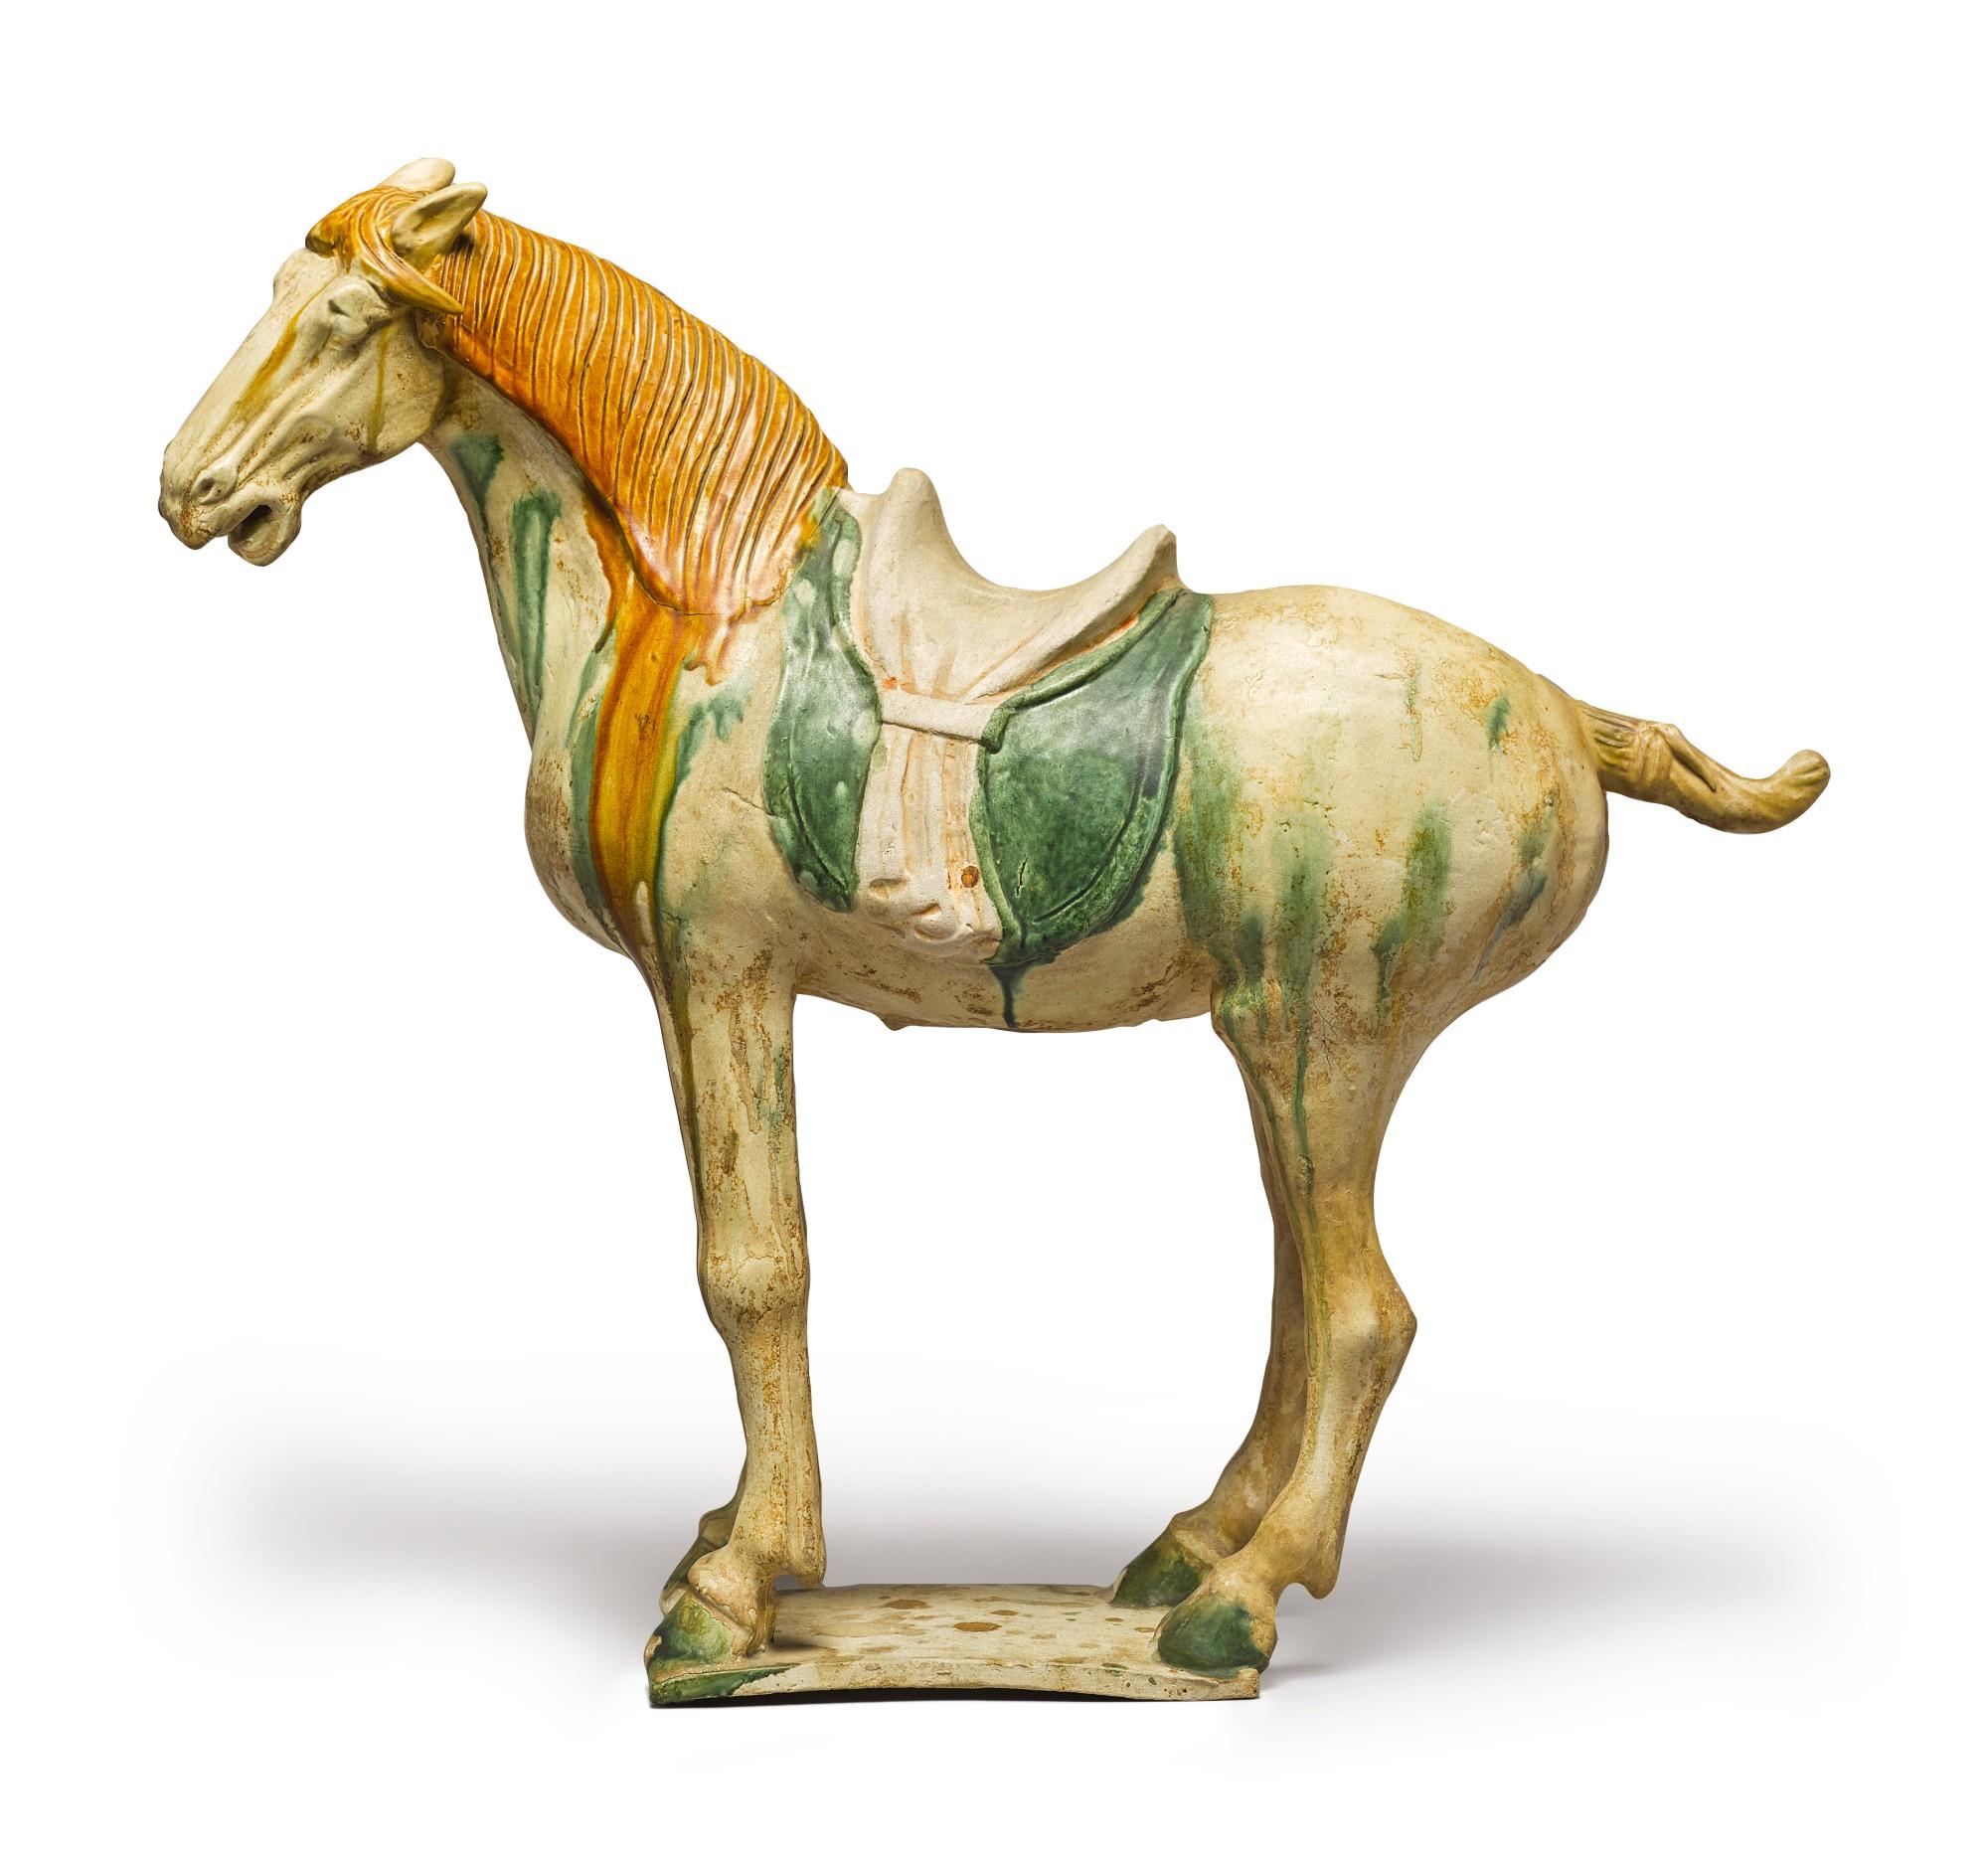 A SANCAI-GLAZED POTTERY FIGURE OF A HORSE, TANG DYNASTY | The ...